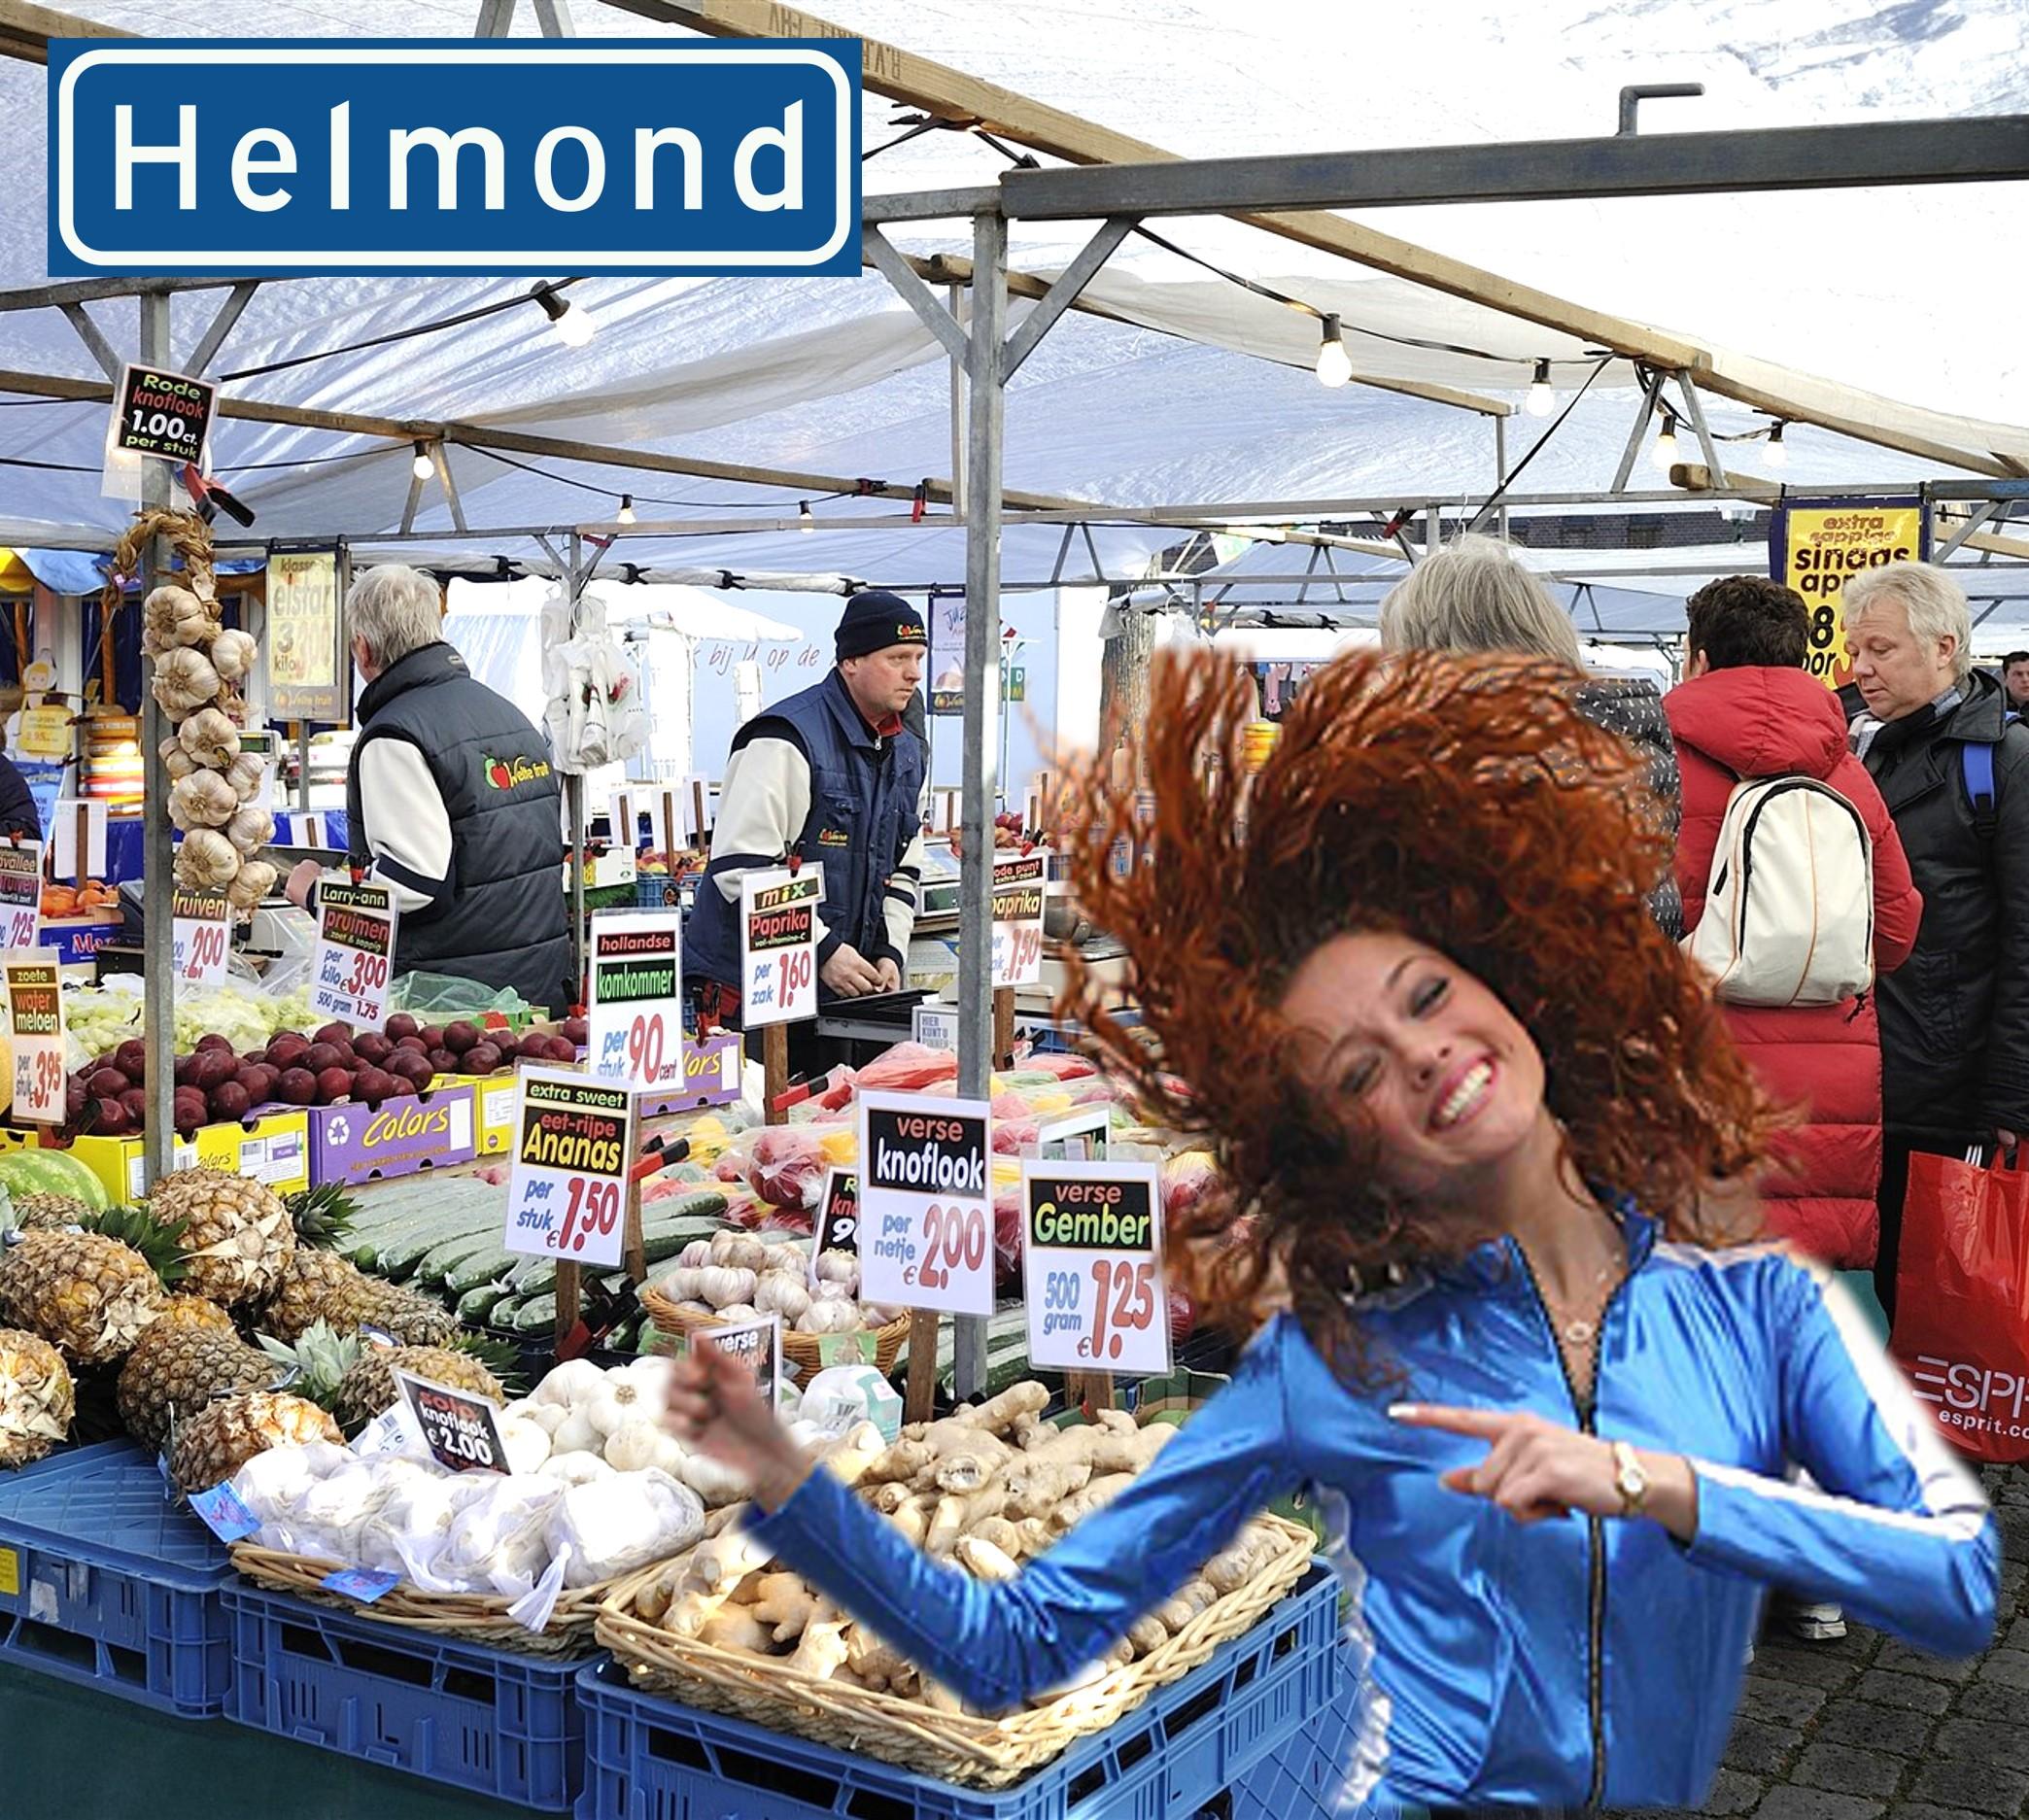 Promoteam op de markt in Helmond